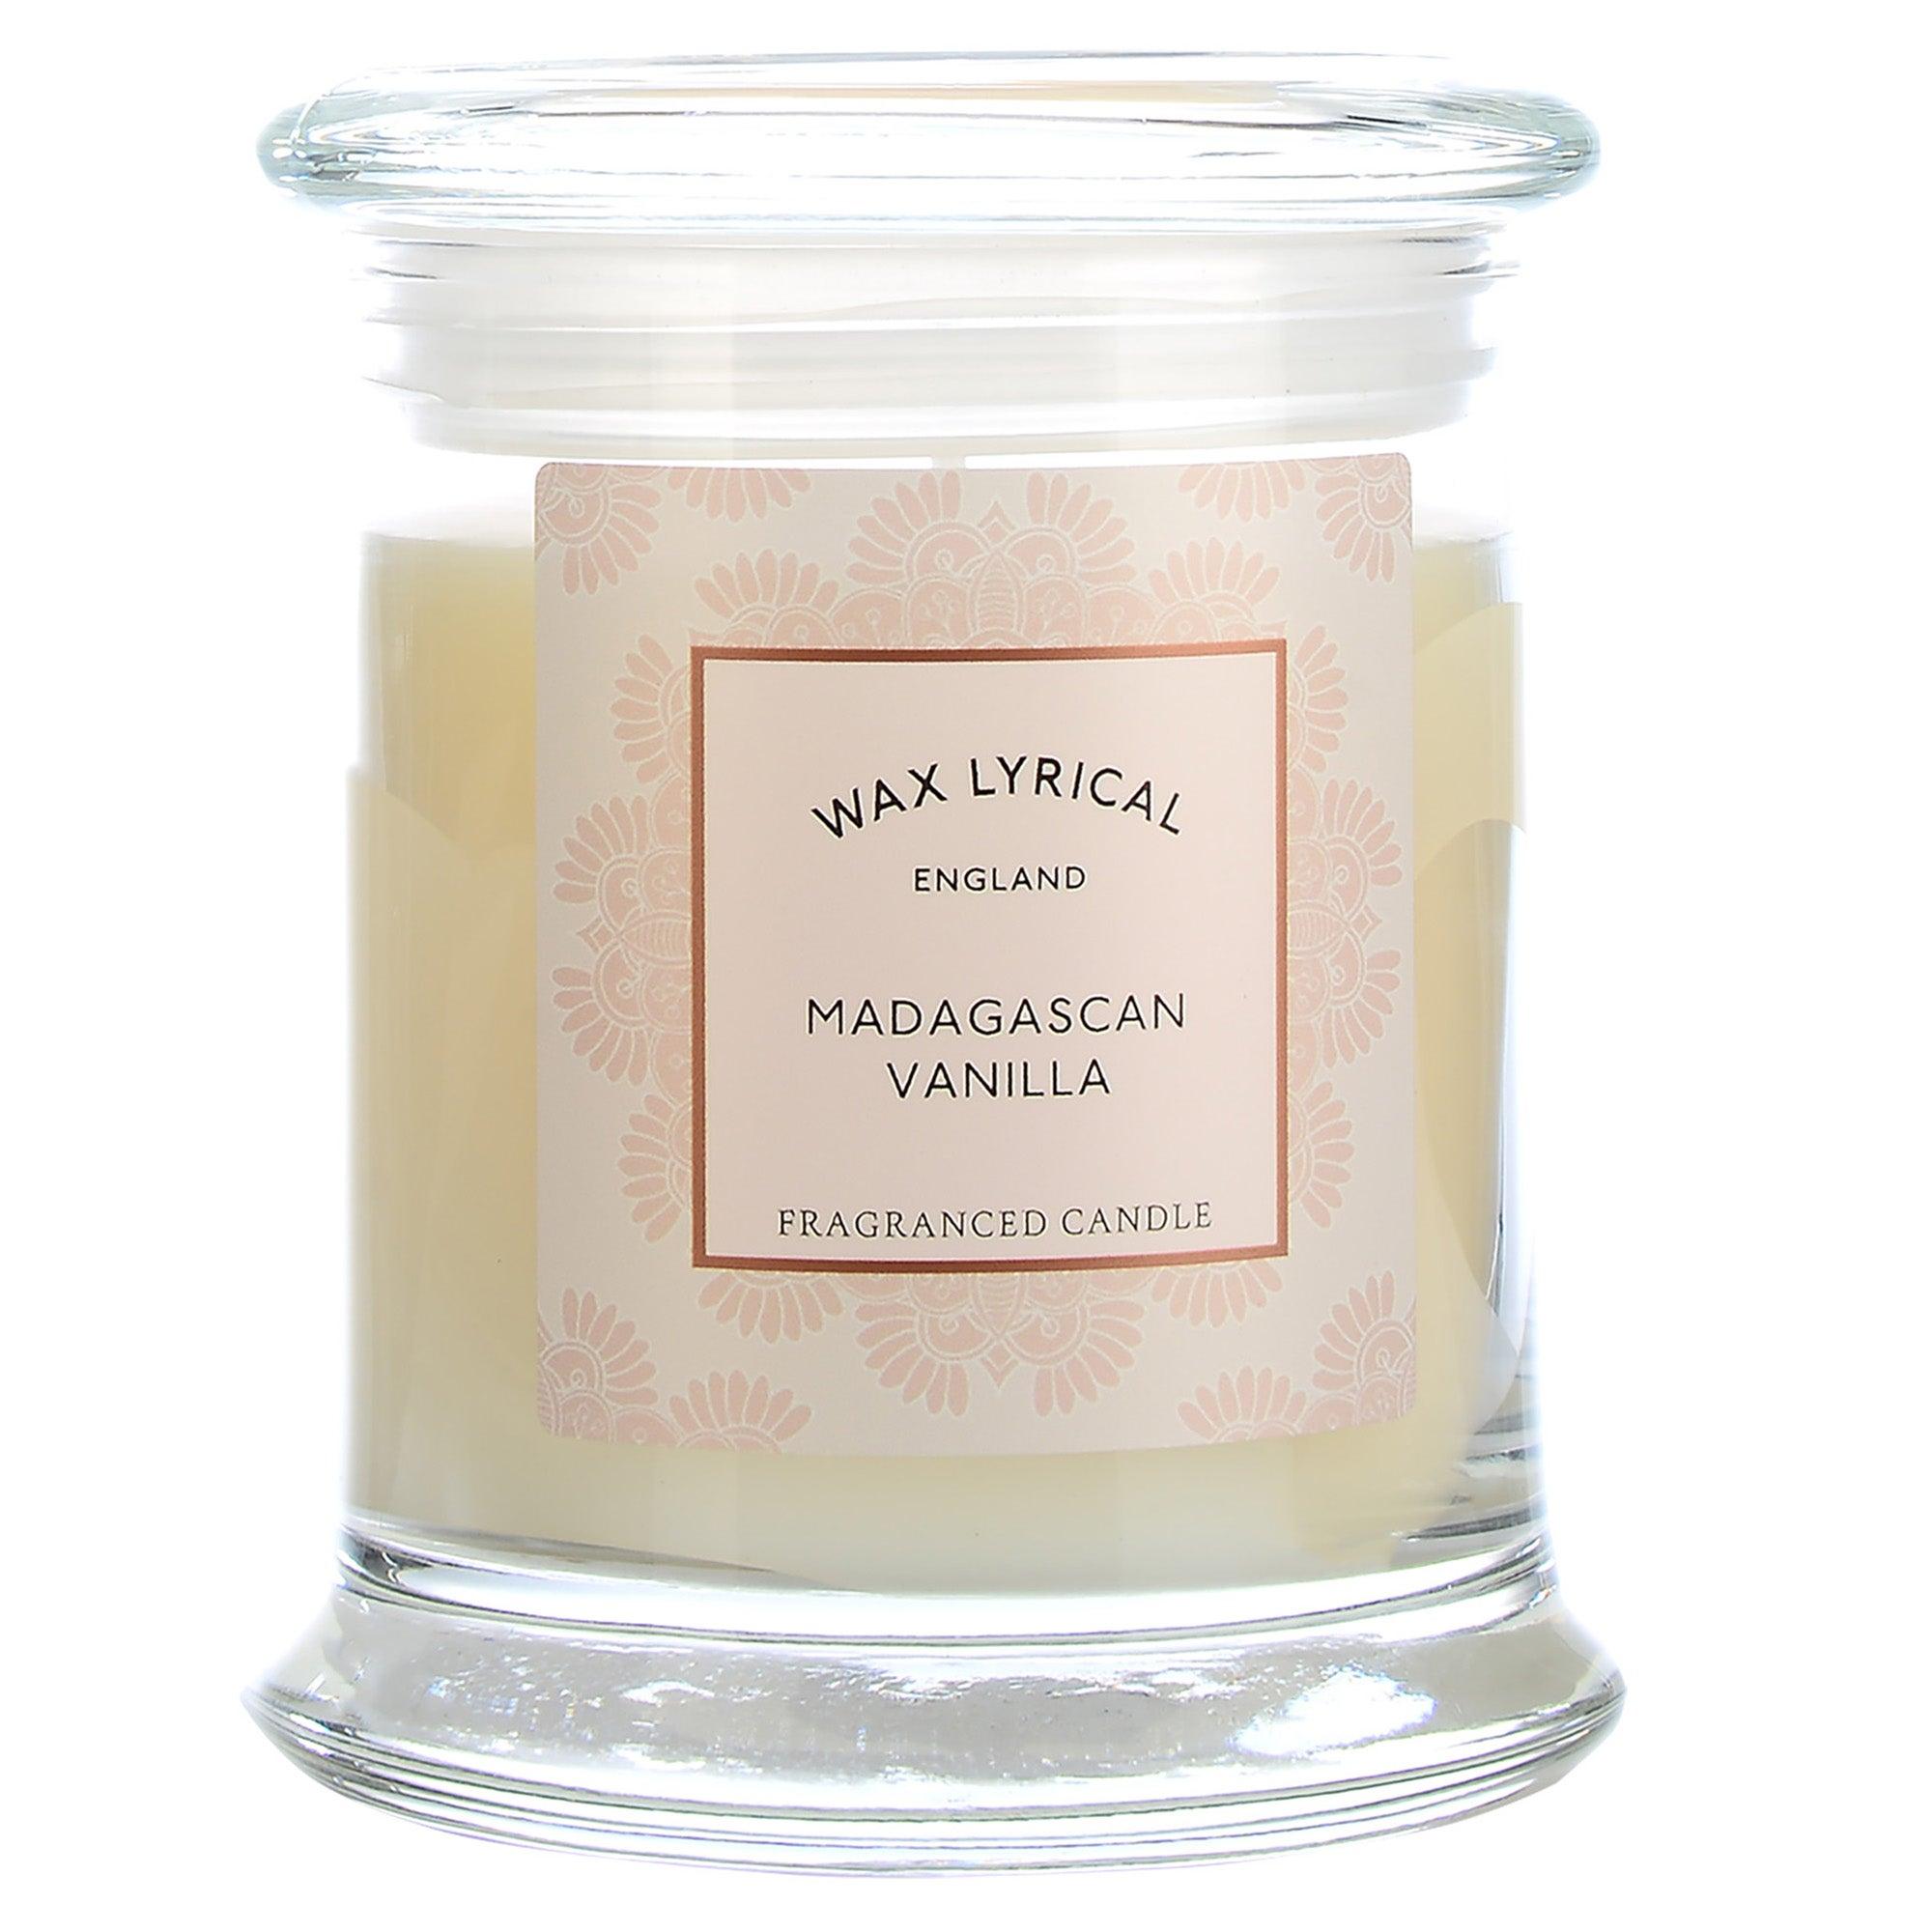 Image of Destinations Madagascan Vanilla Candle Jar Cream (Natural)